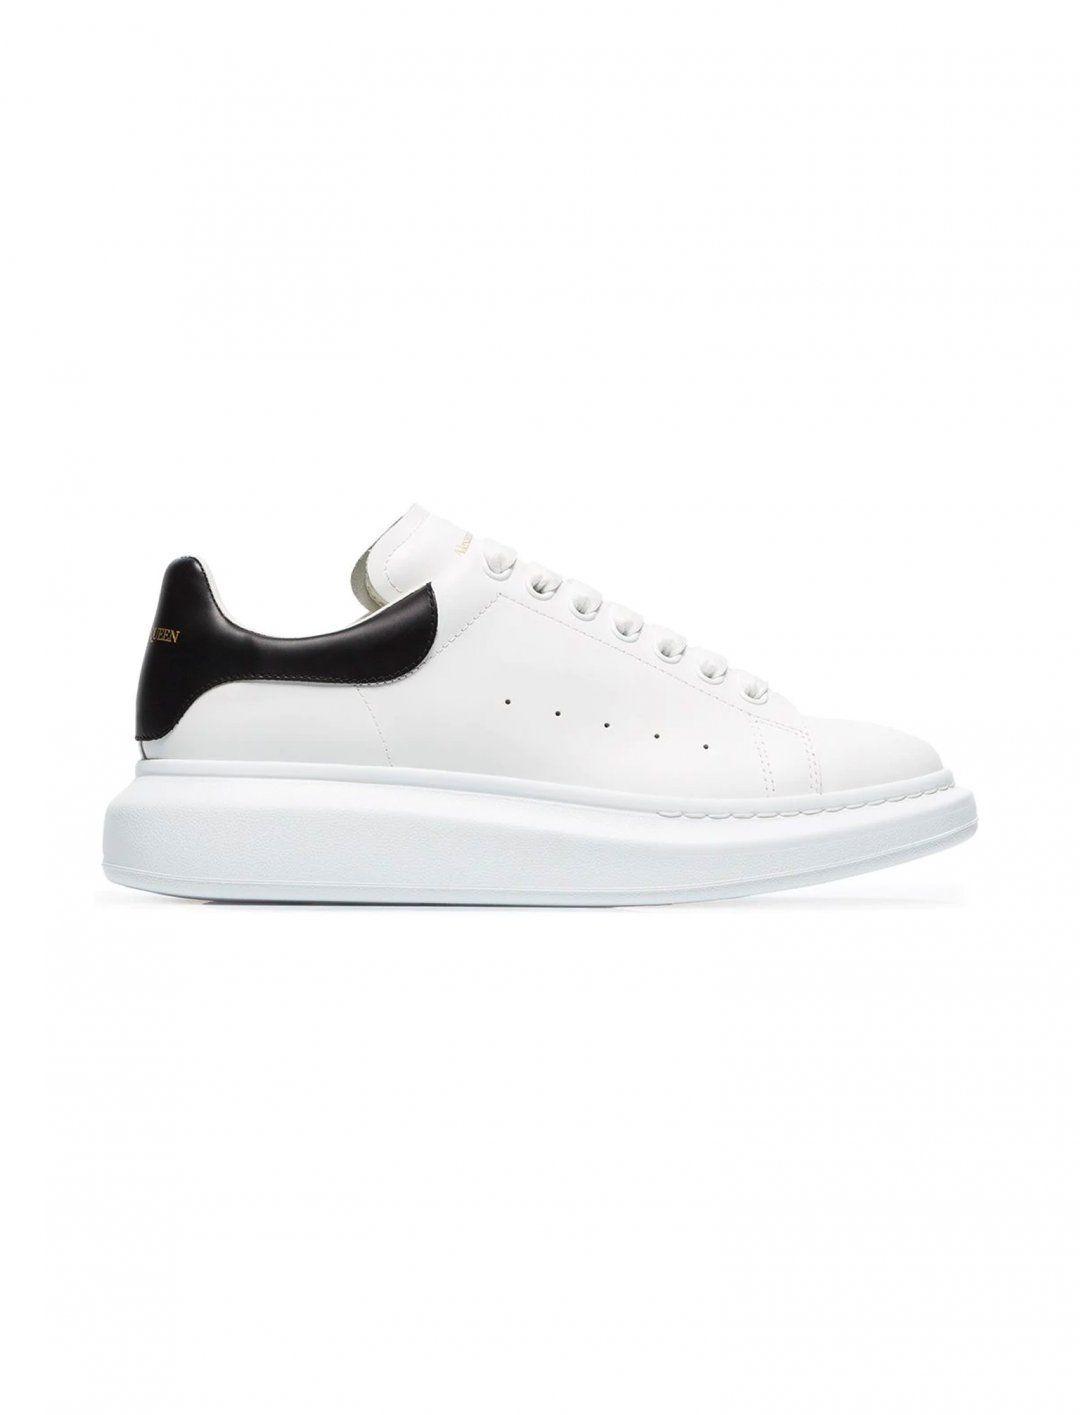 J Styles Sneakers, Alexander McQueen - Fake Nails ...